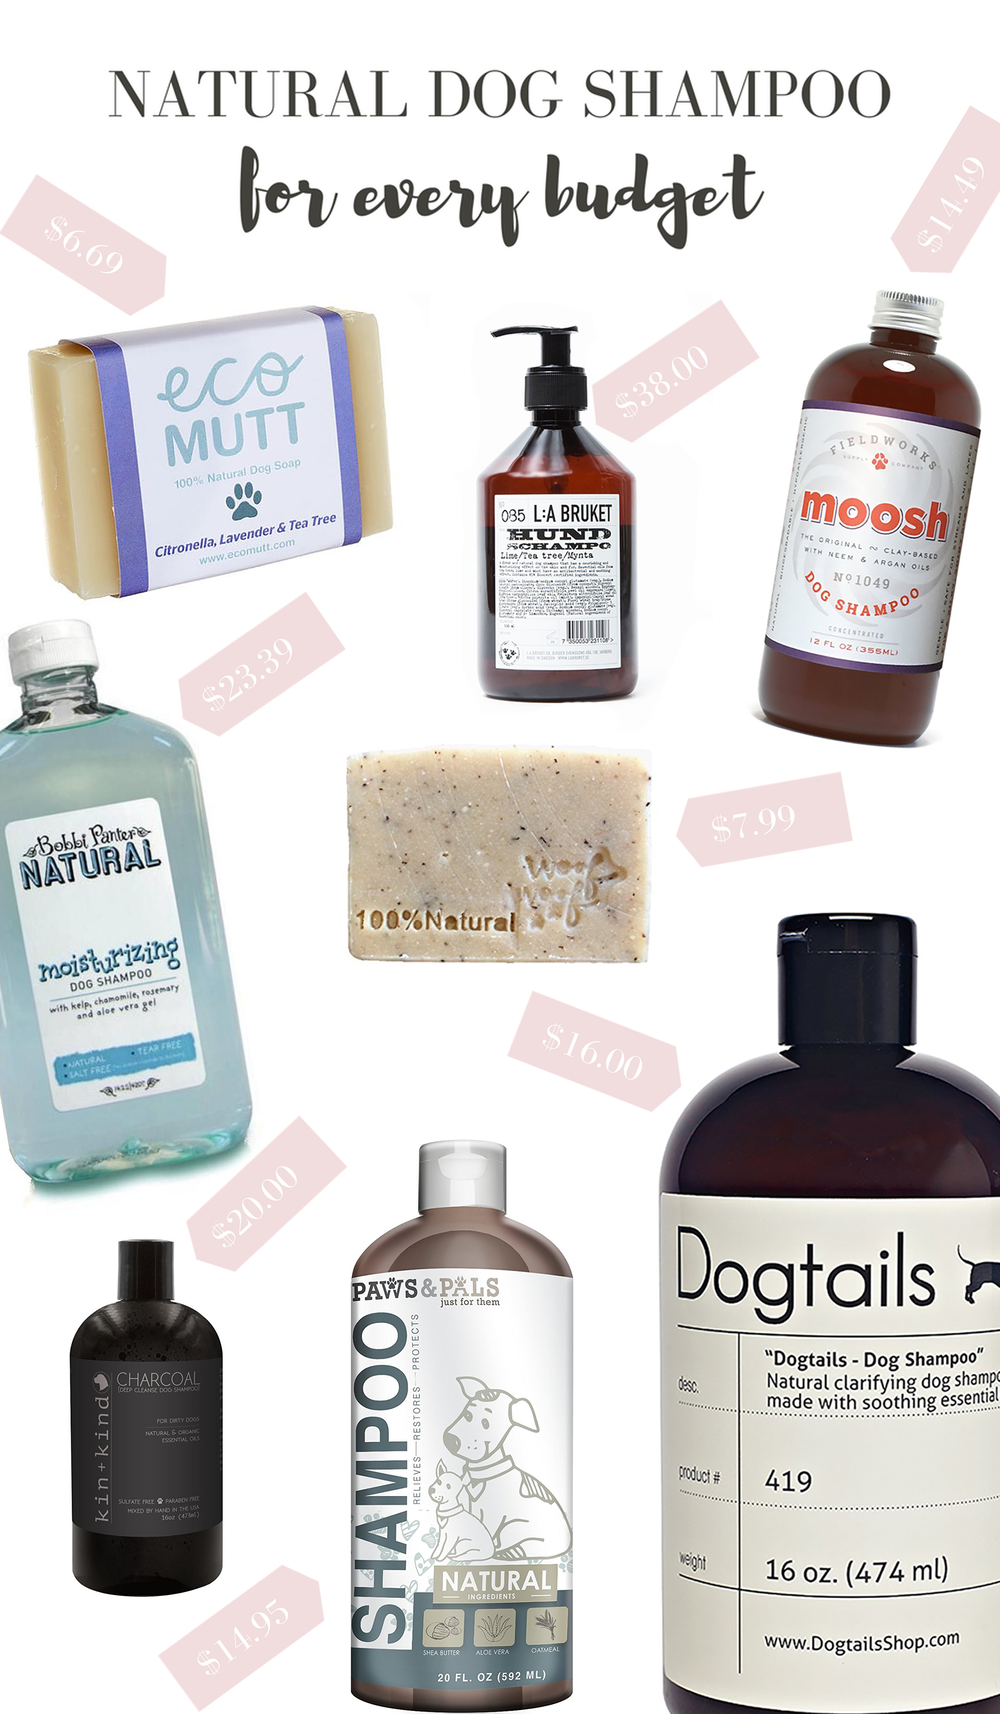 naturaldogshampoo.png